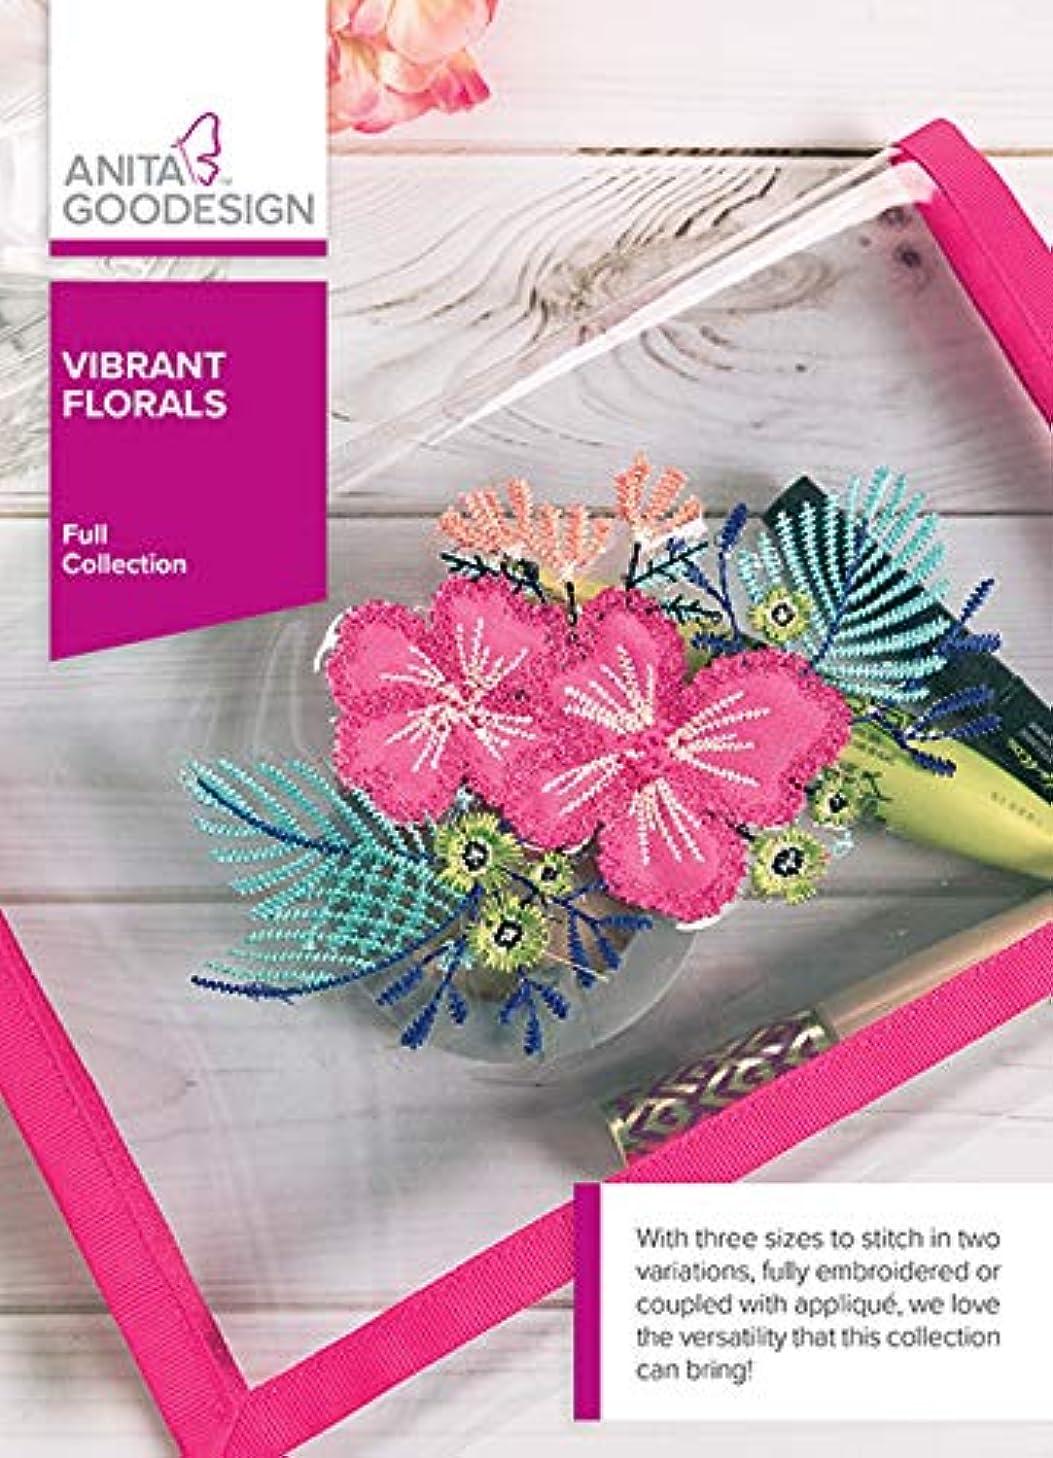 Anita Goodesign Embroidery Machine Designs CD Vibrant Florals